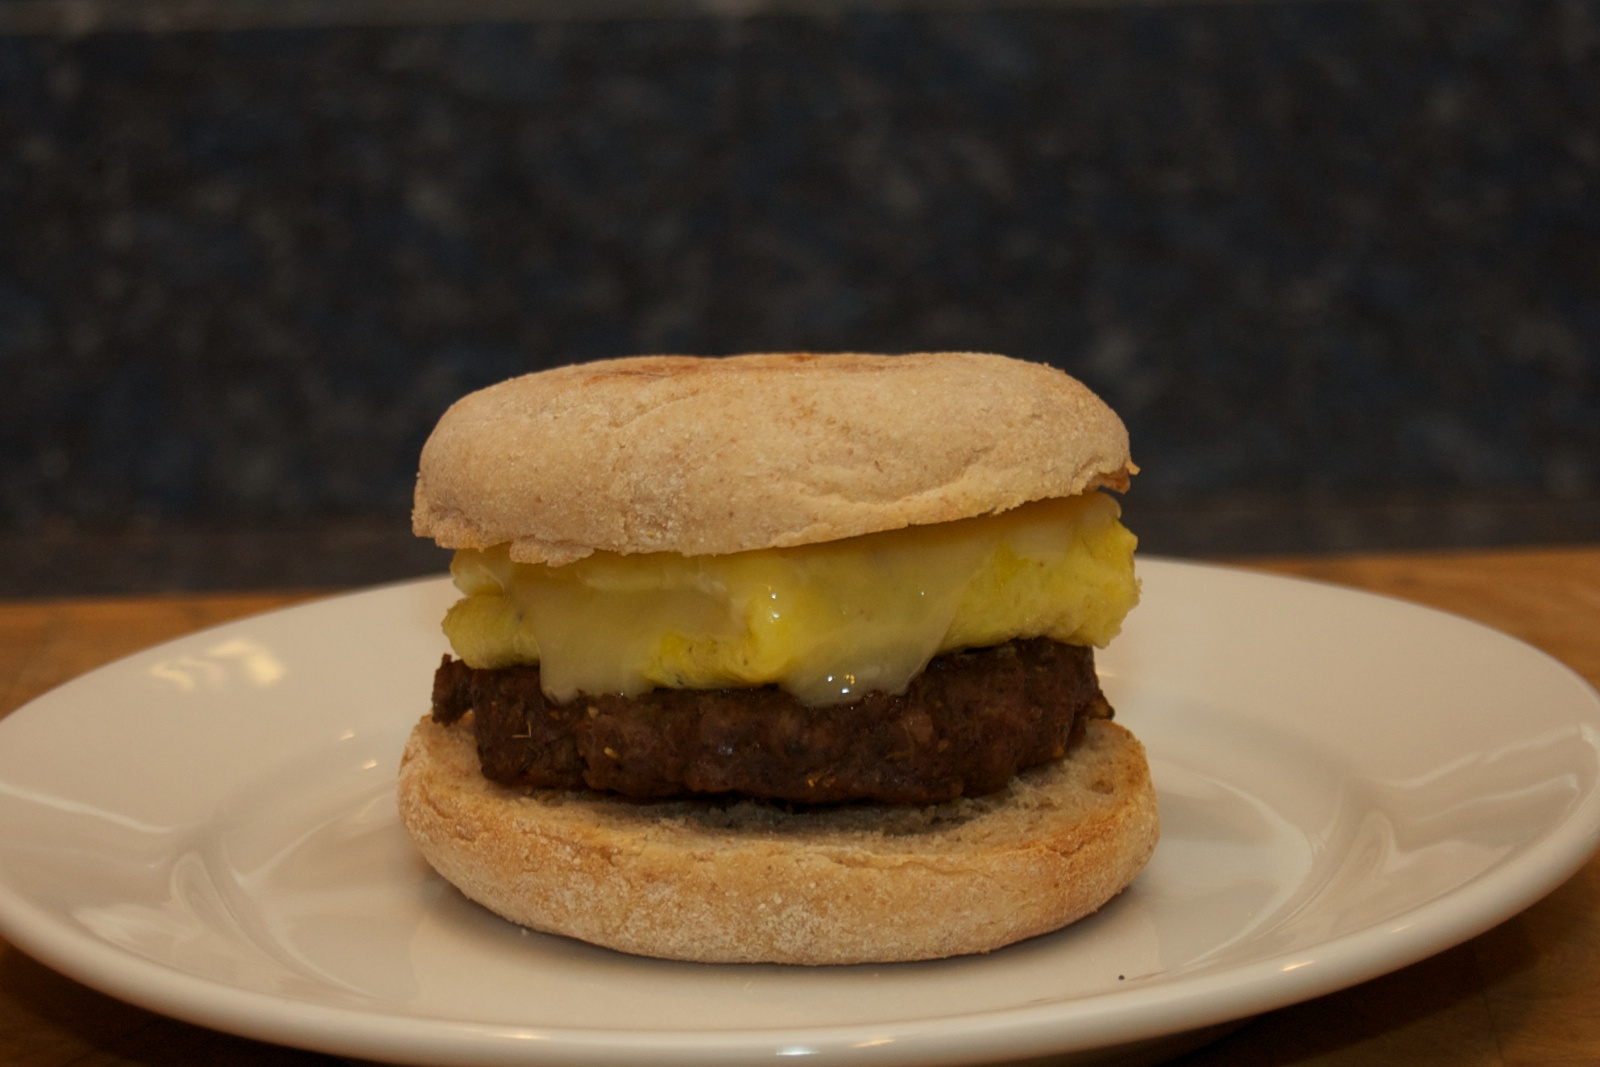 http://blog.rickk.com/food/2013/11/14/ate.2013.11.14.b.jpg